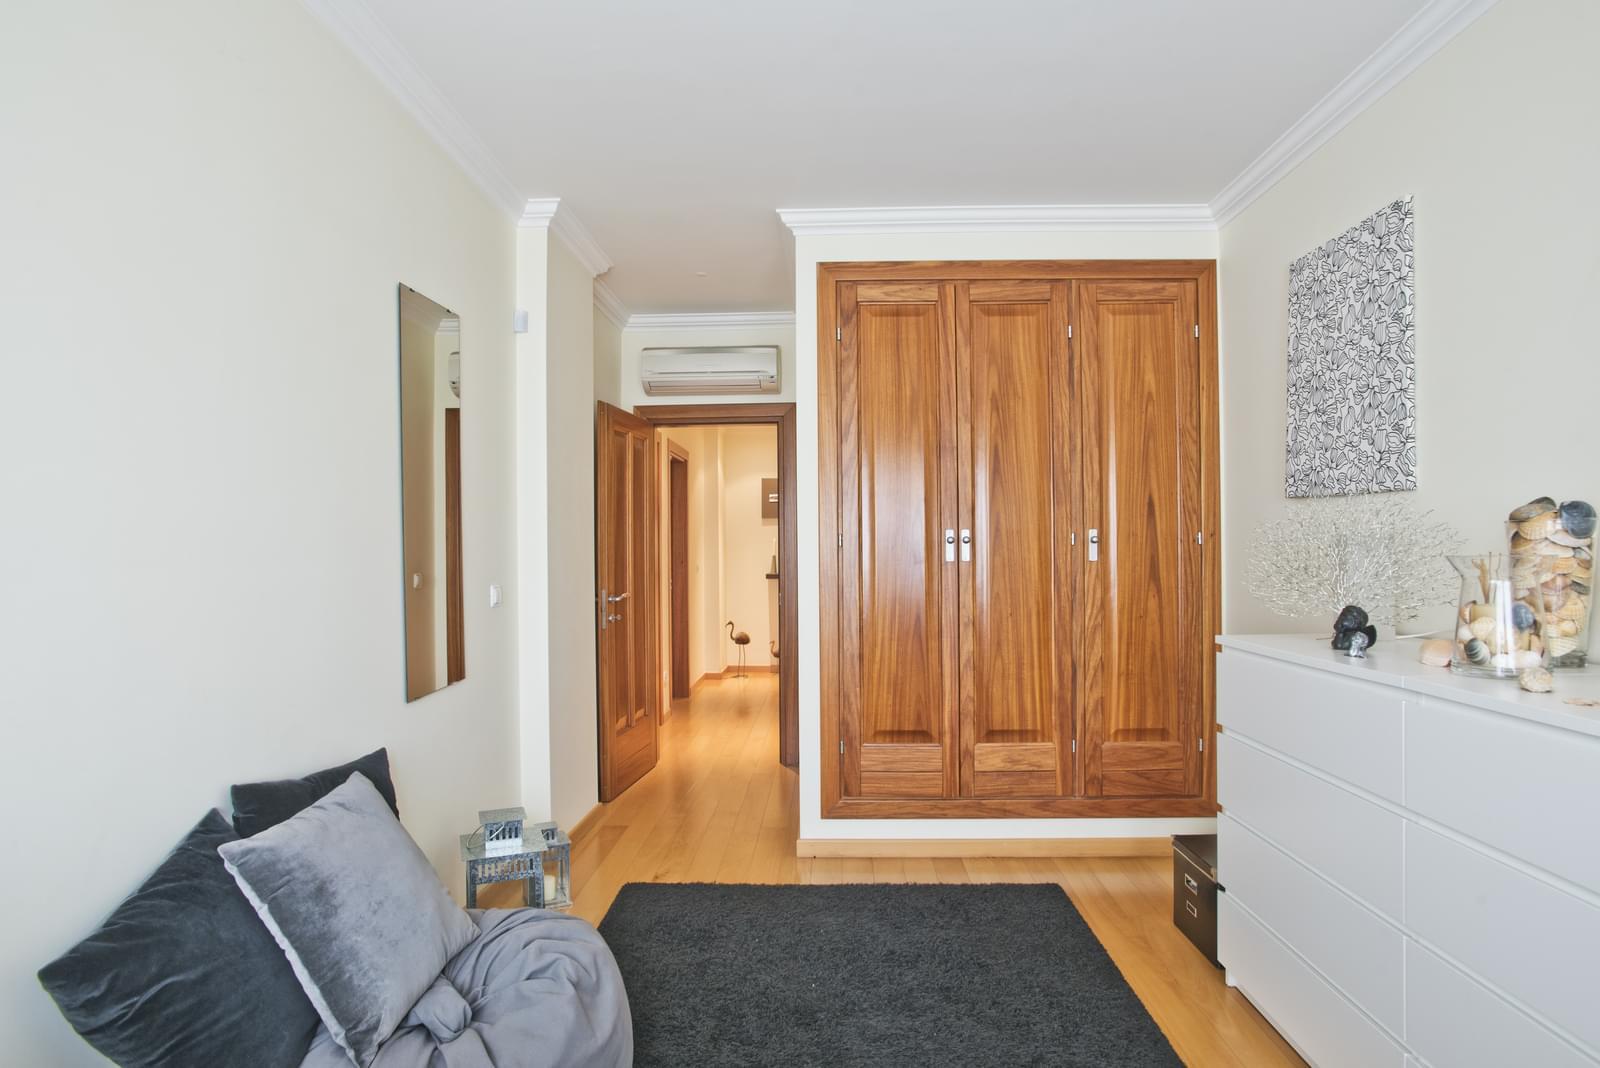 pf17004-apartamento-t3-cascais-62d300cc-d591-48f6-91a7-35fc59061033